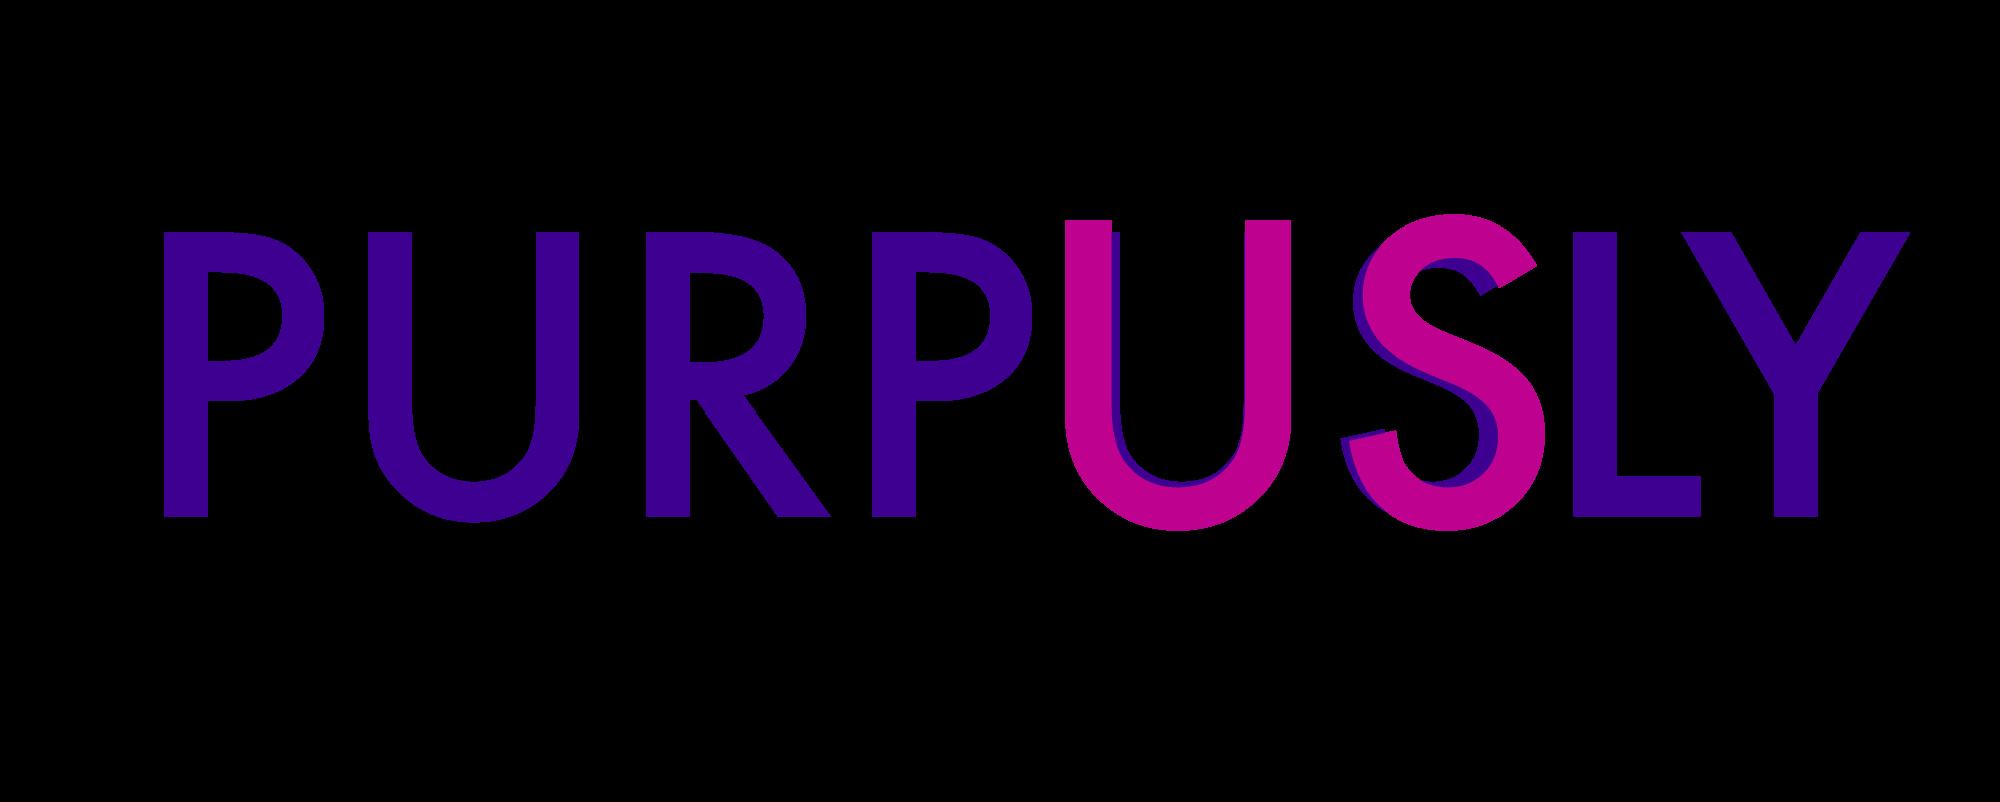 Purpusly Vendors